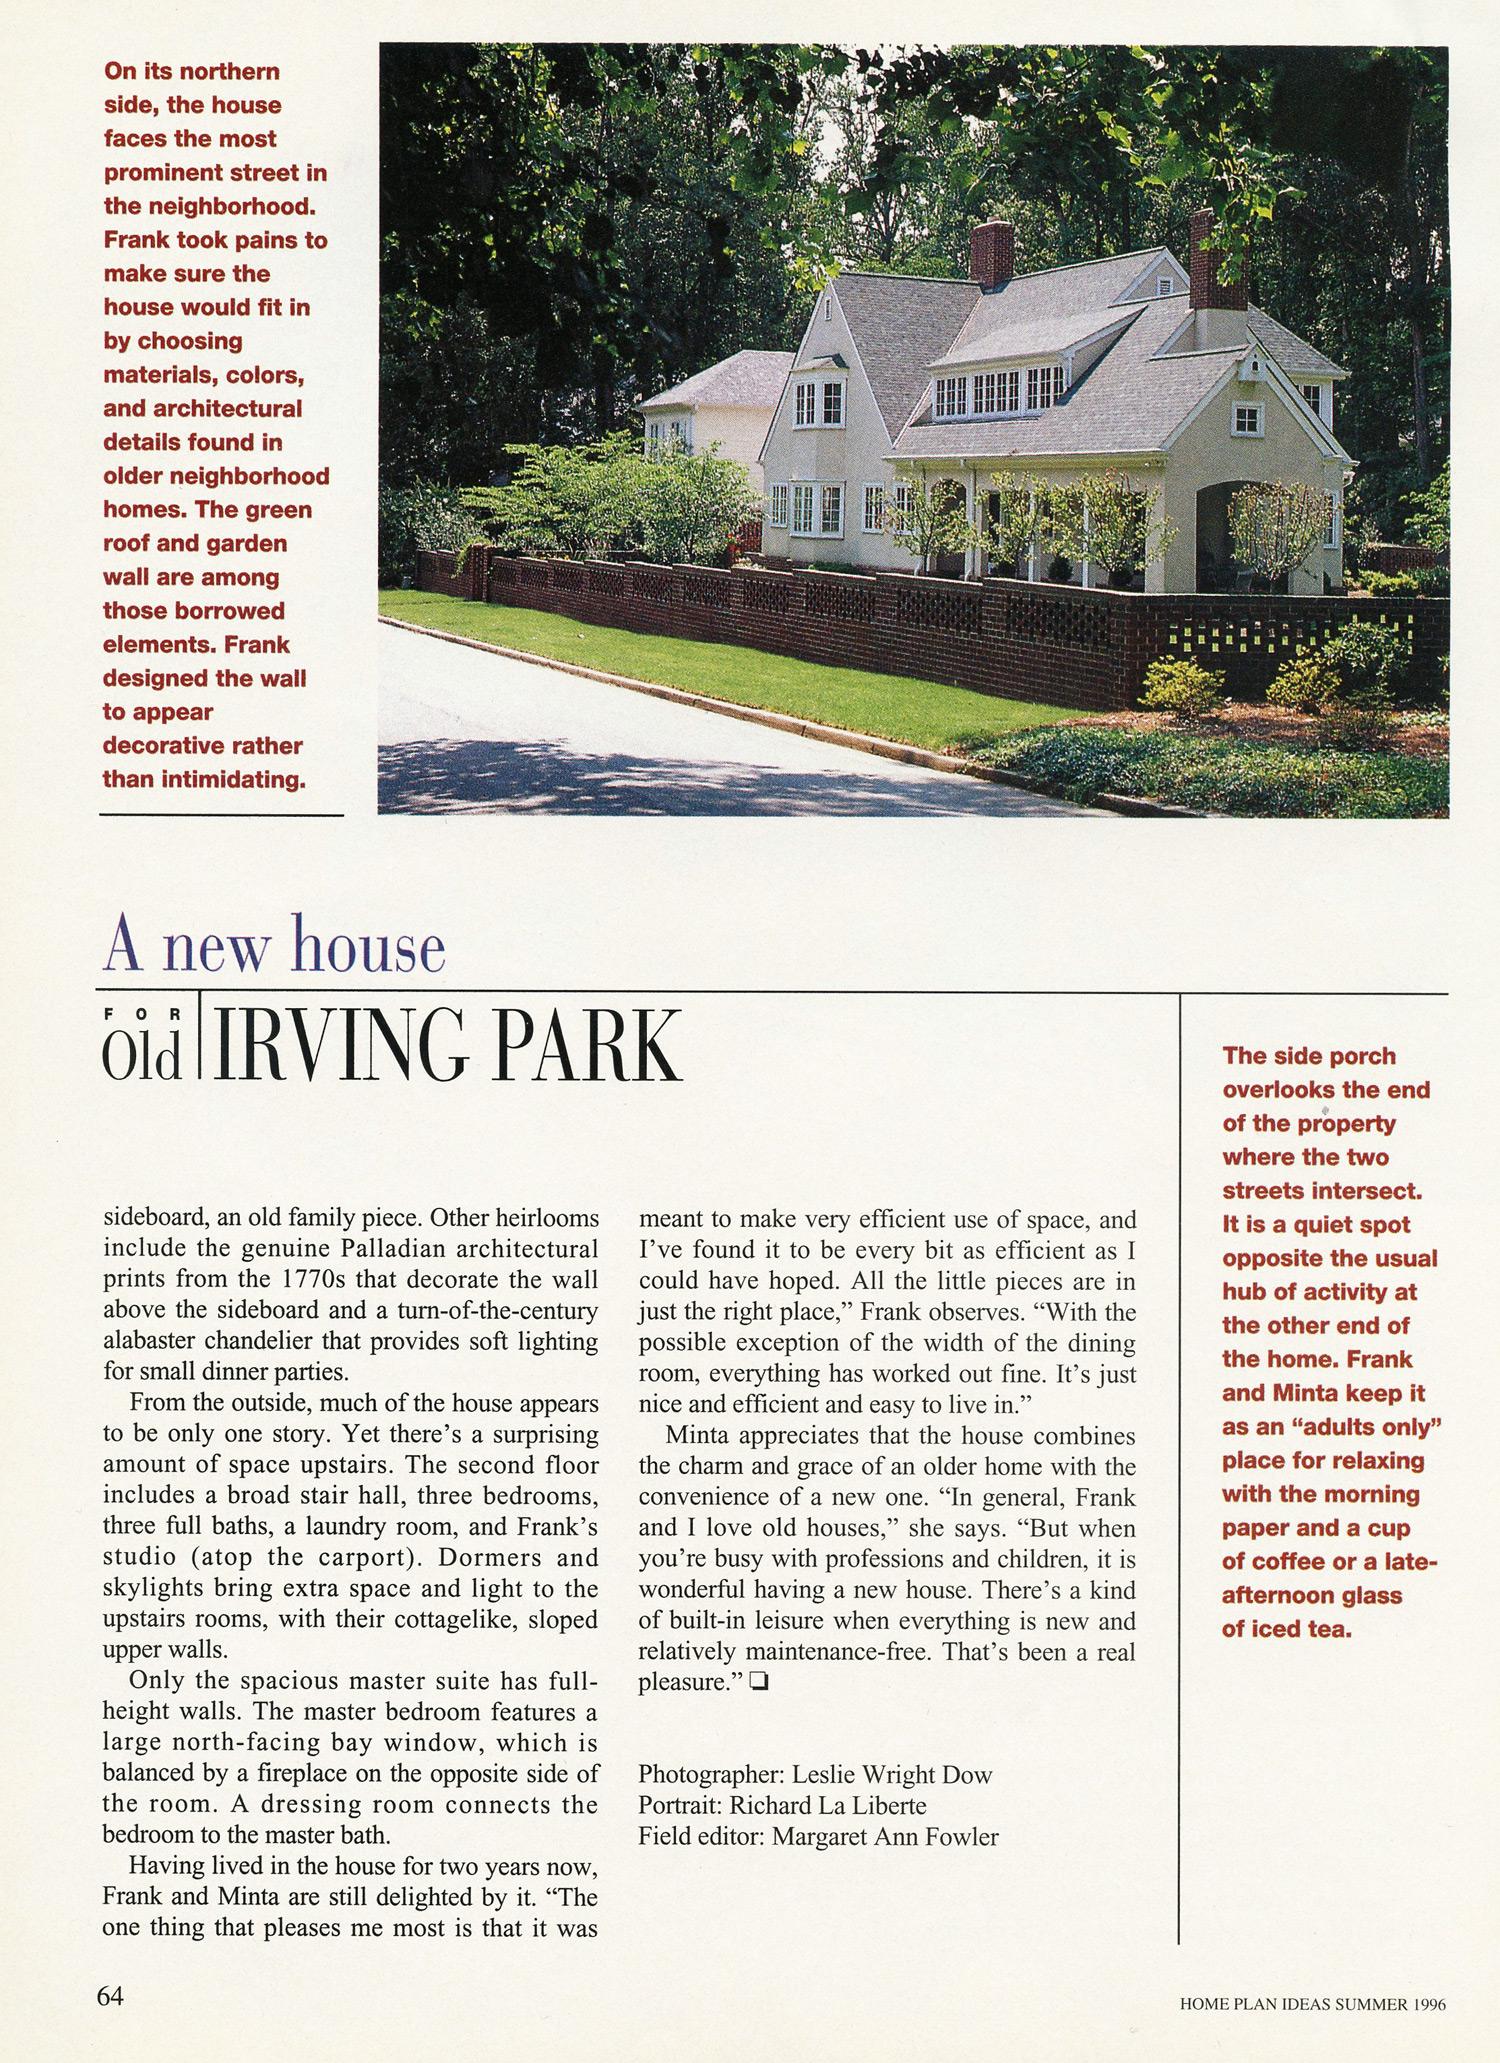 home-plan-ideas-summer-1996-frank-cheney-architect-8.jpg